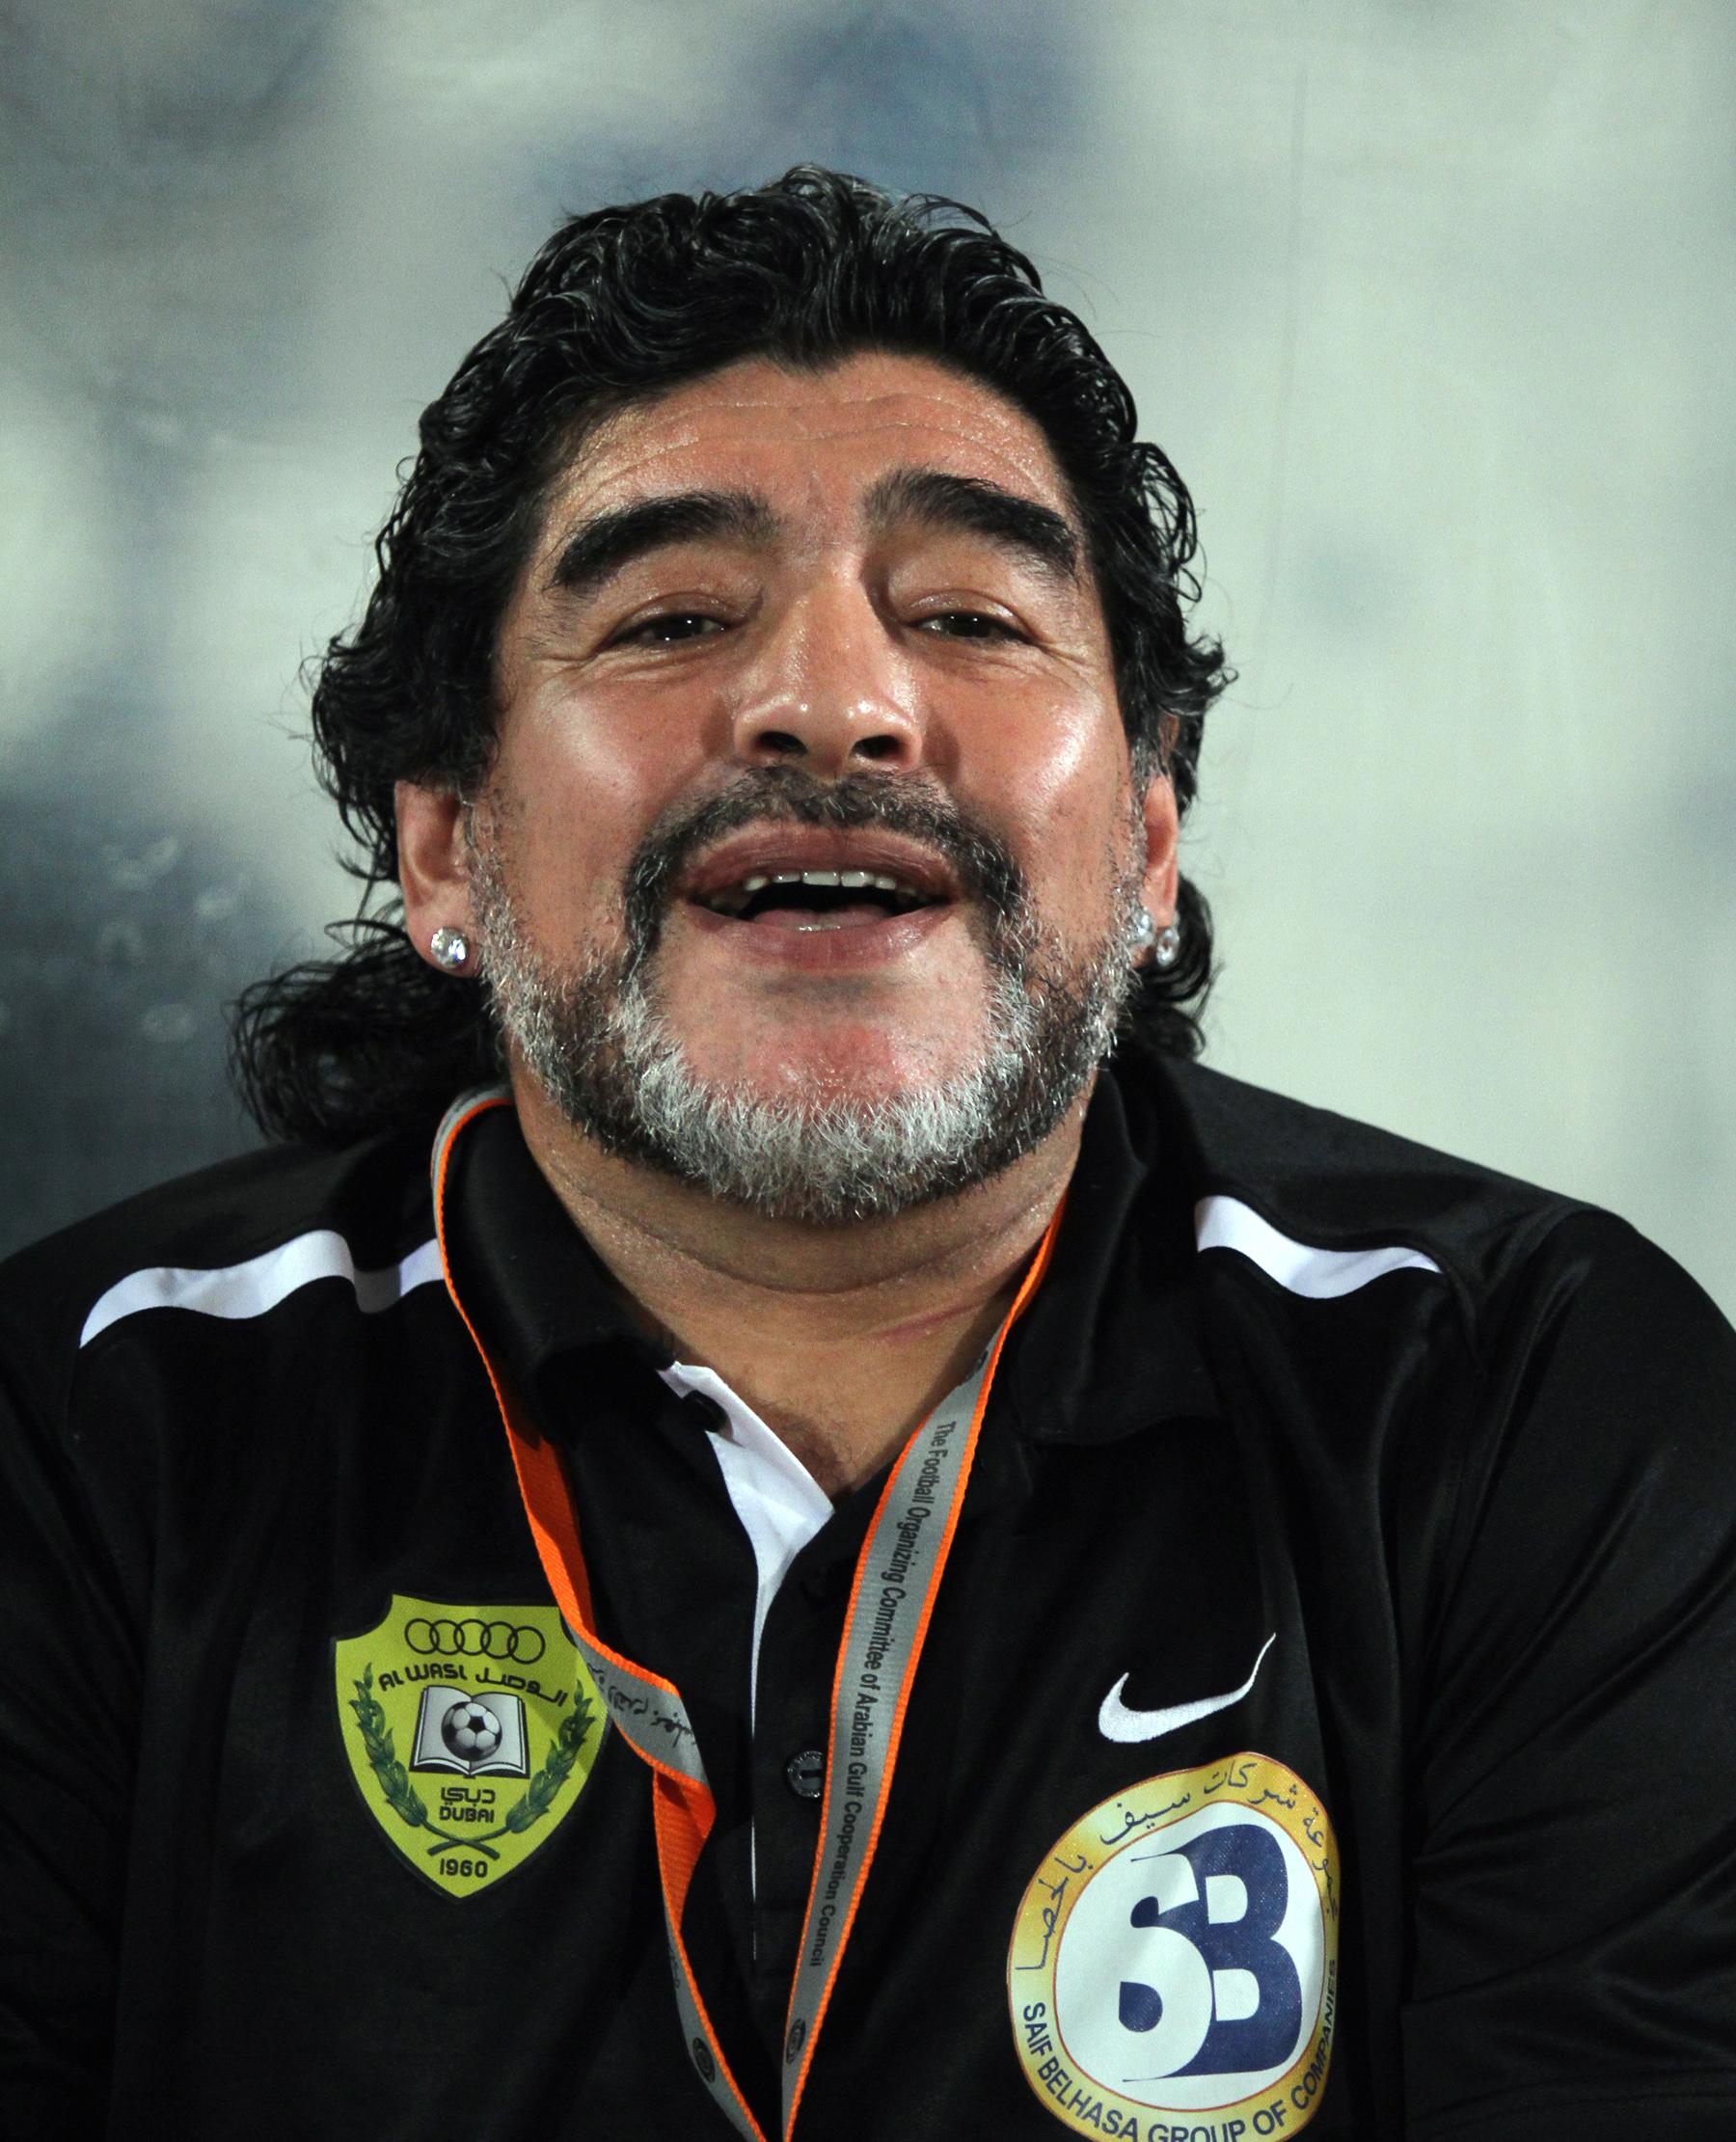 फुटबलर डिएगो म्याराडोनाको निधन